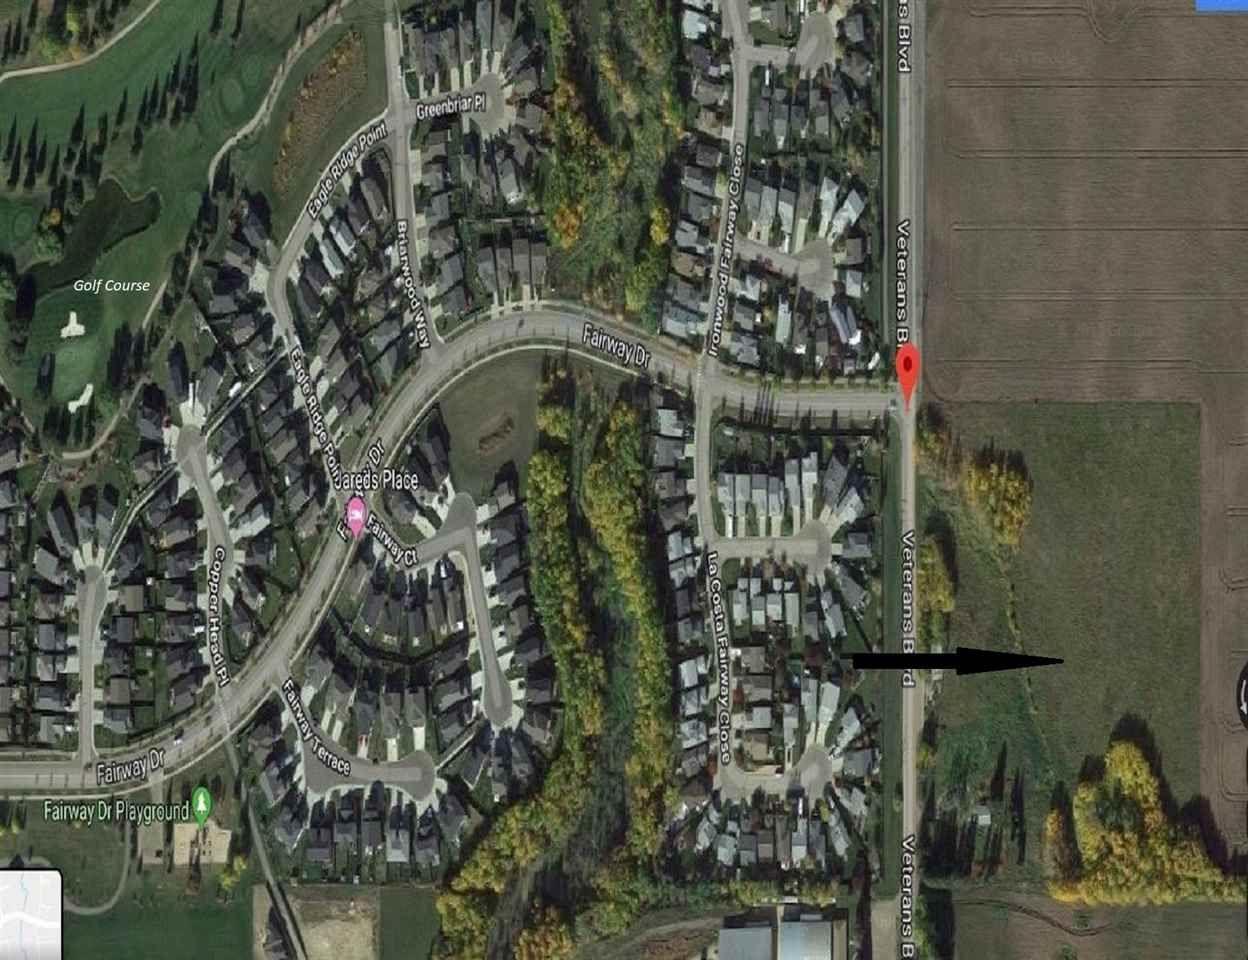 Main Photo: 52501 Rge Rd 275: Stony Plain Land Commercial for sale : MLS®# E4057727